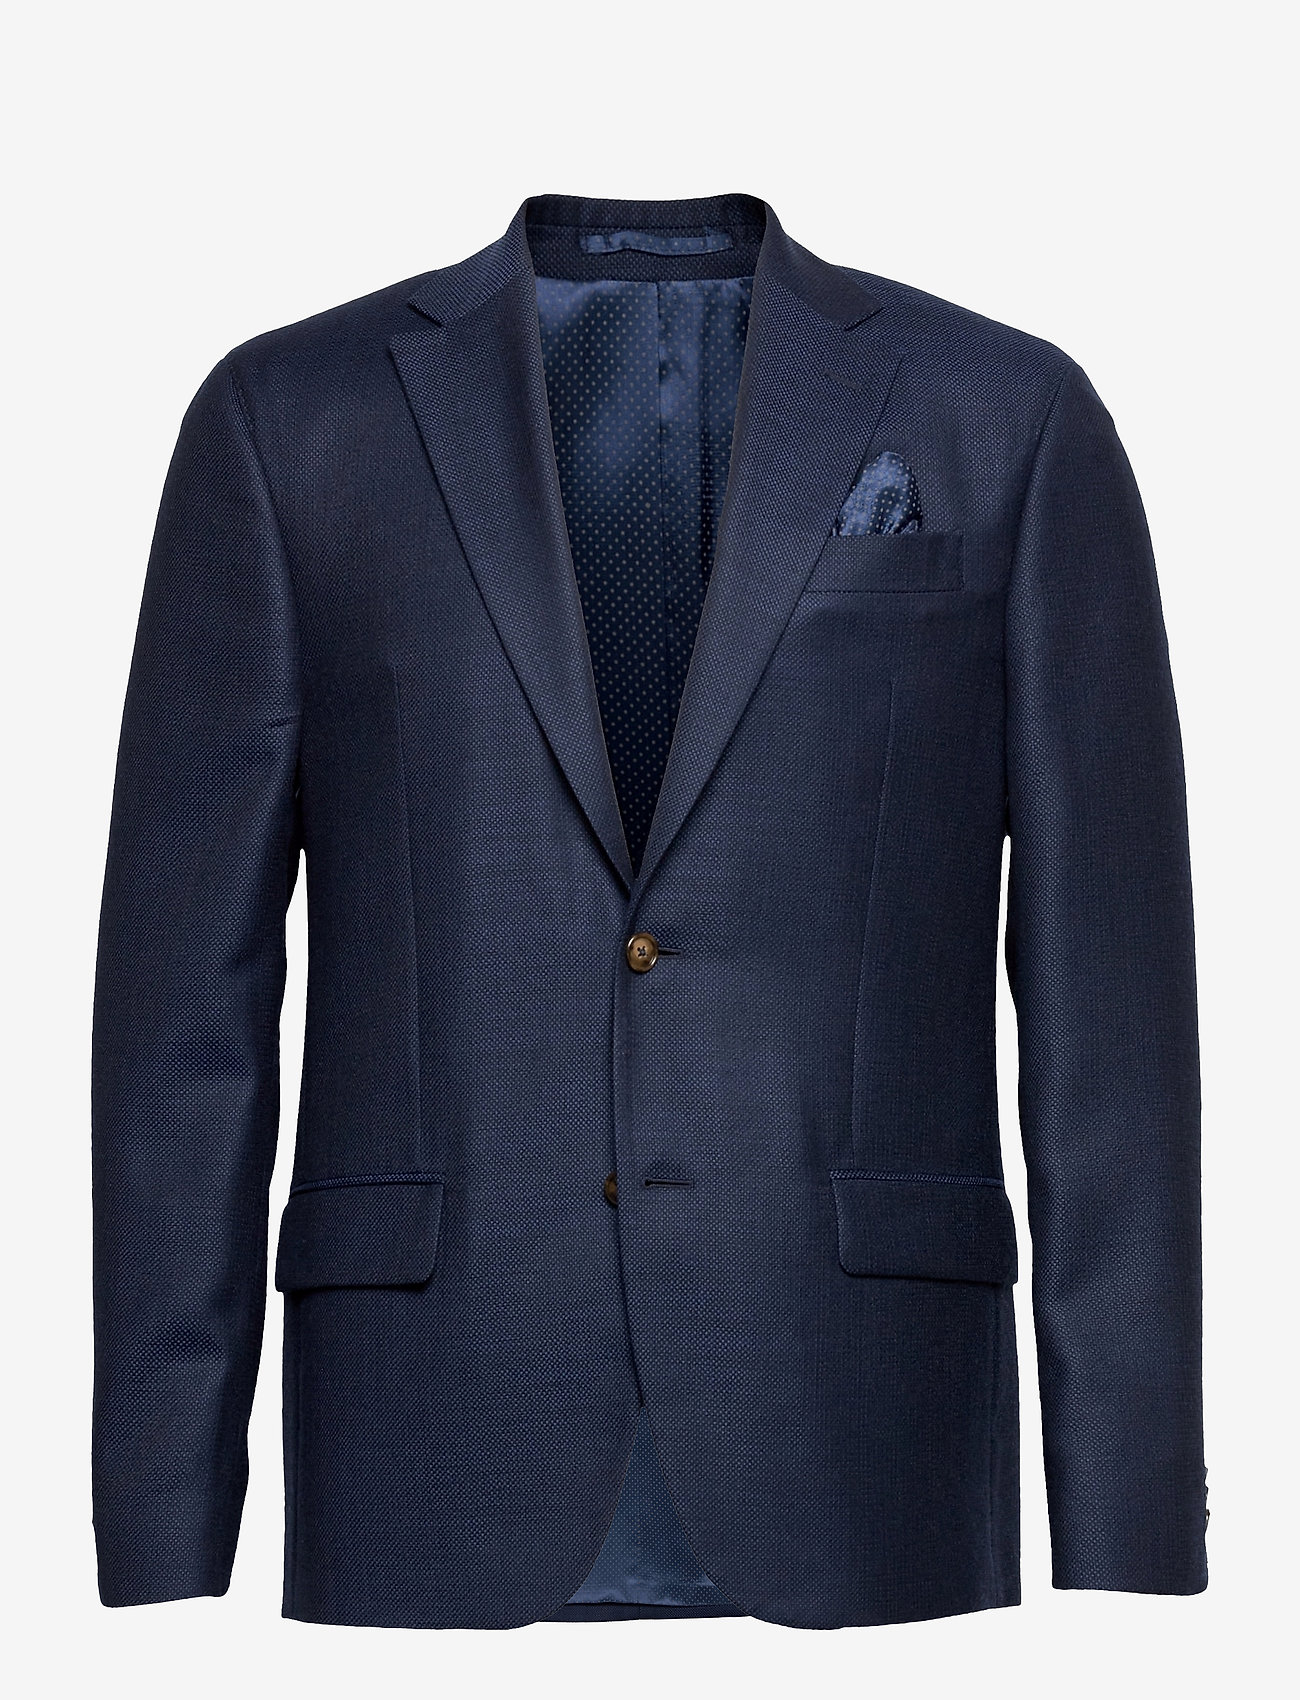 SAND - 6729 - Star Napoli Normal - single breasted blazers - medium blue - 0